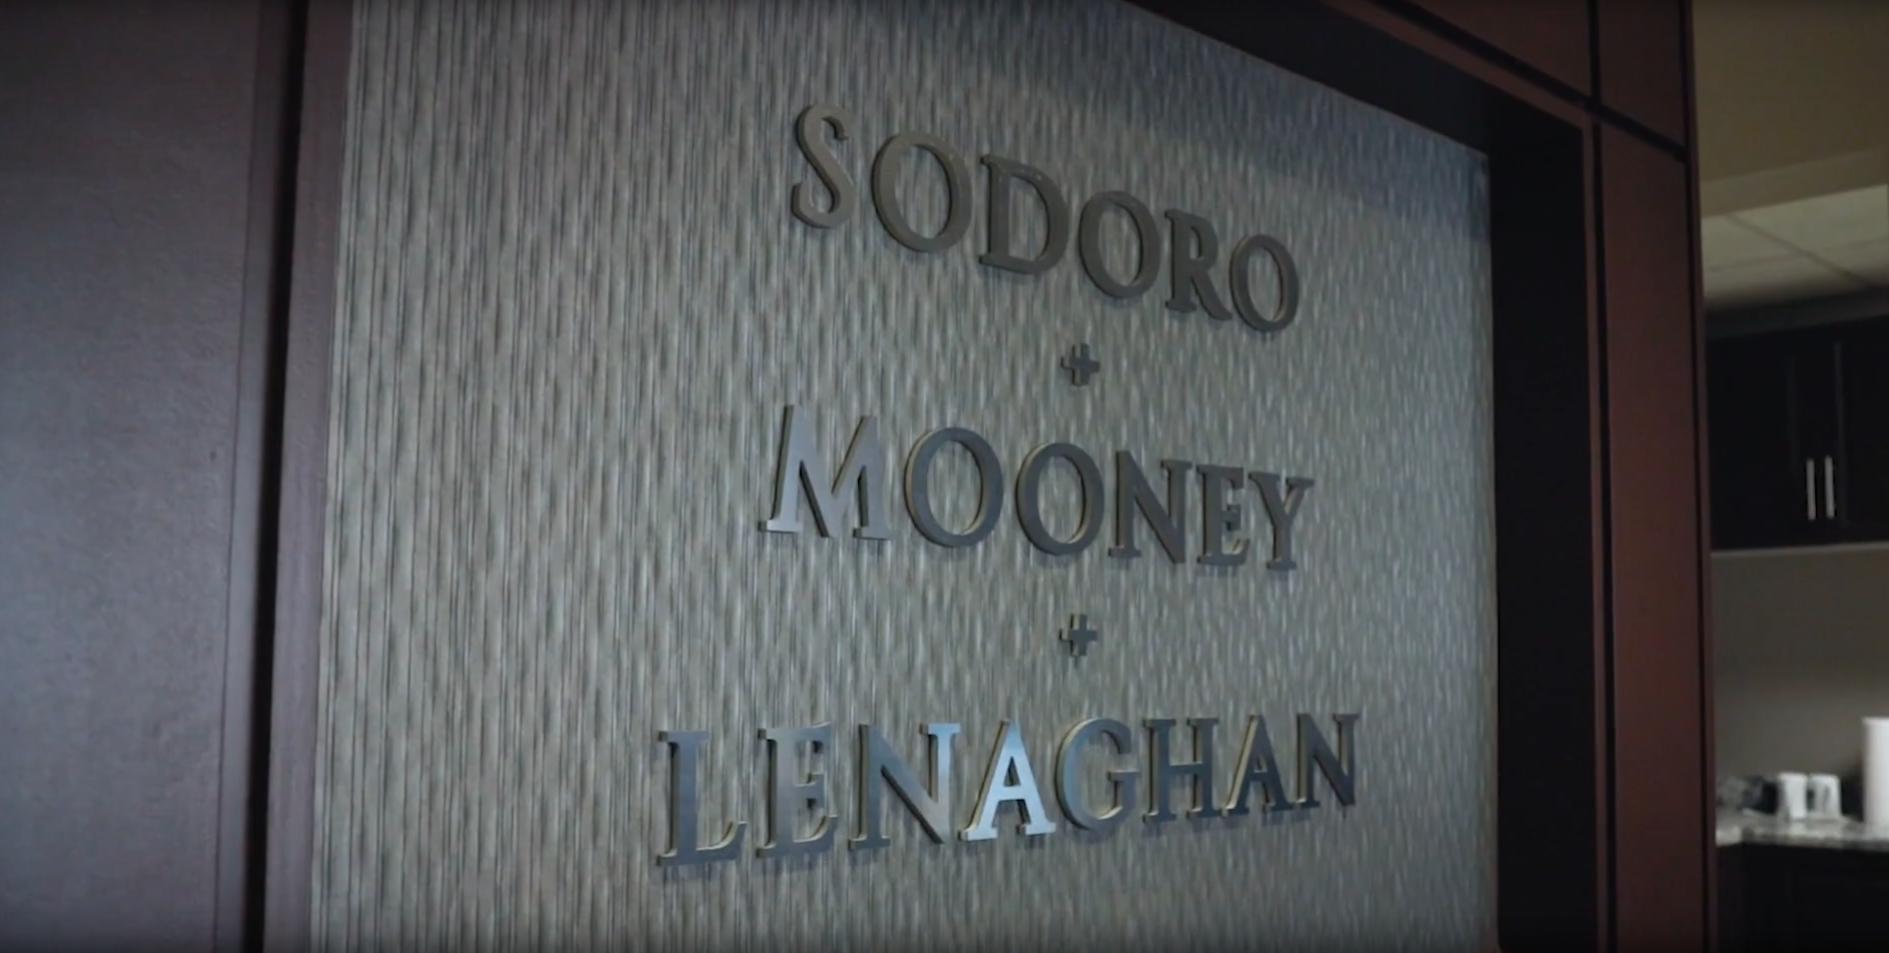 Sodoro Mooney Lenaghan